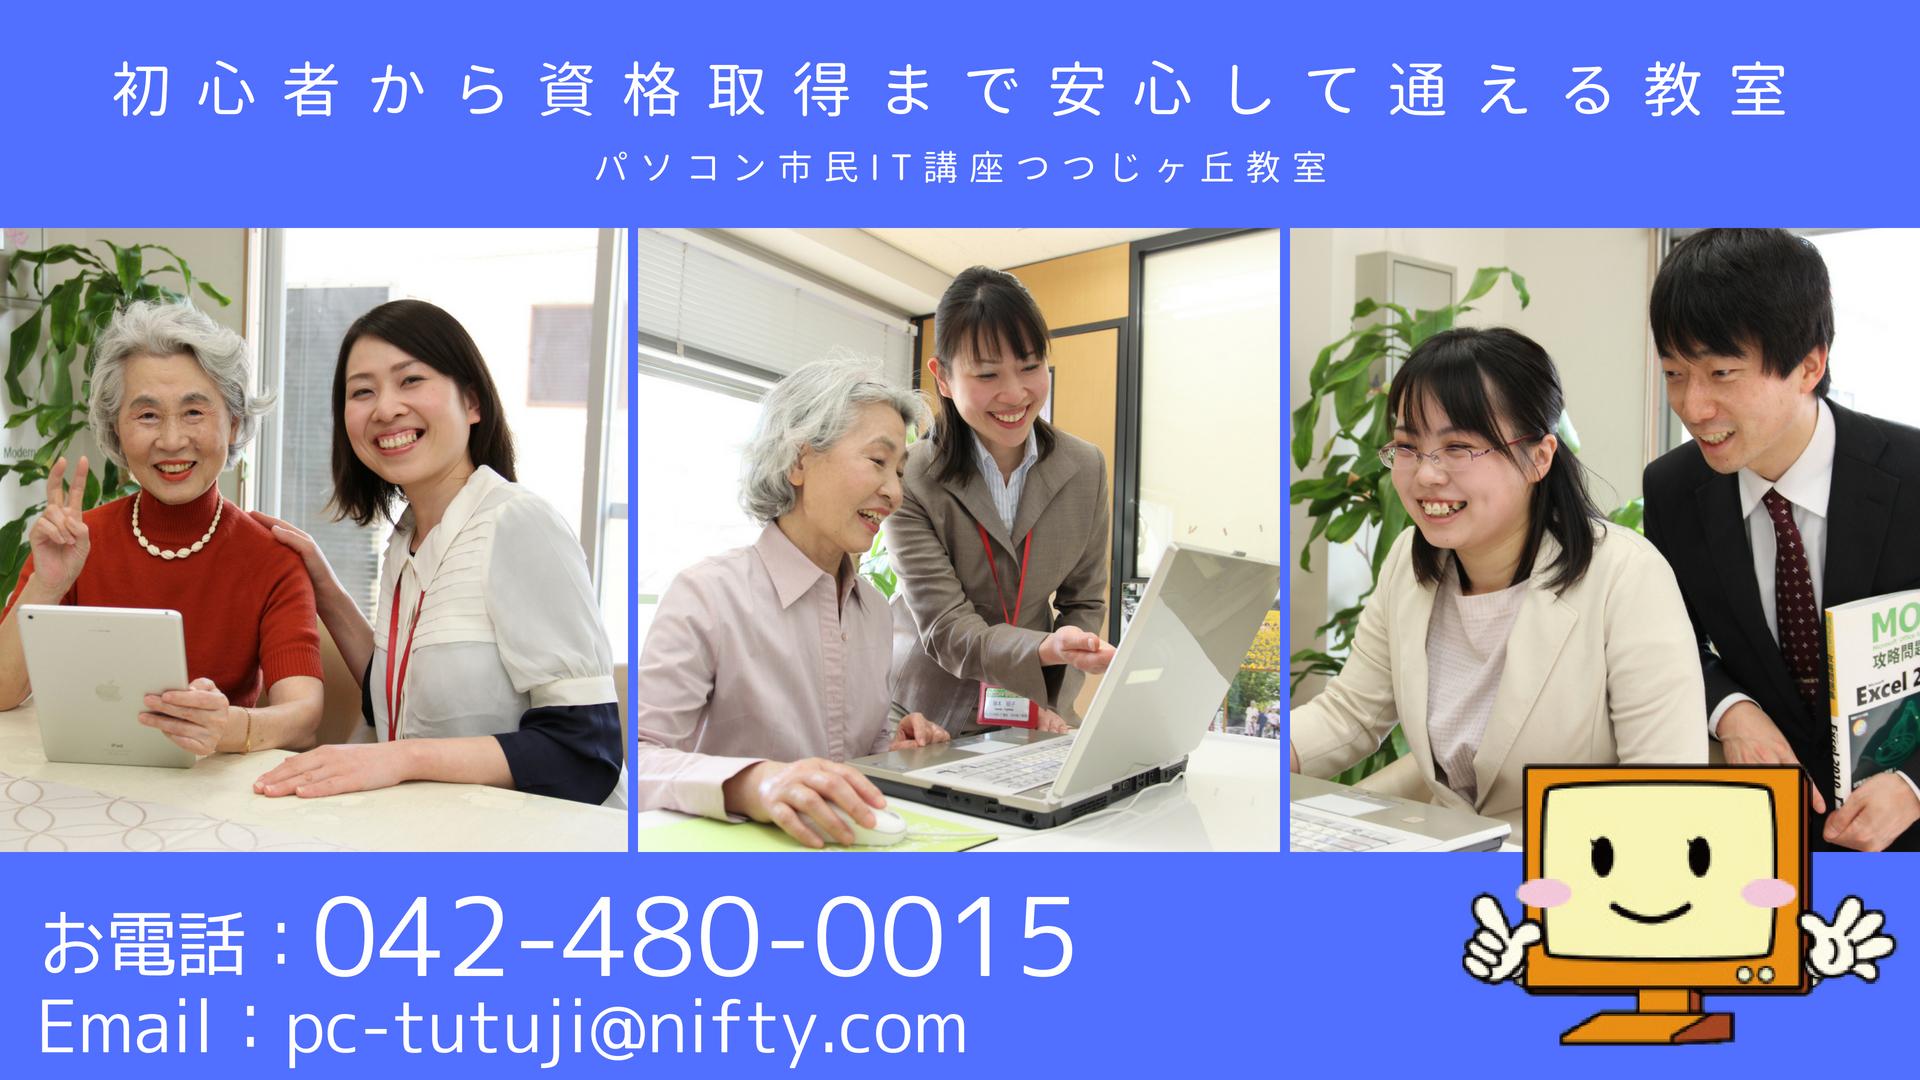 top-banner-pc-tutuji-201806.jpg